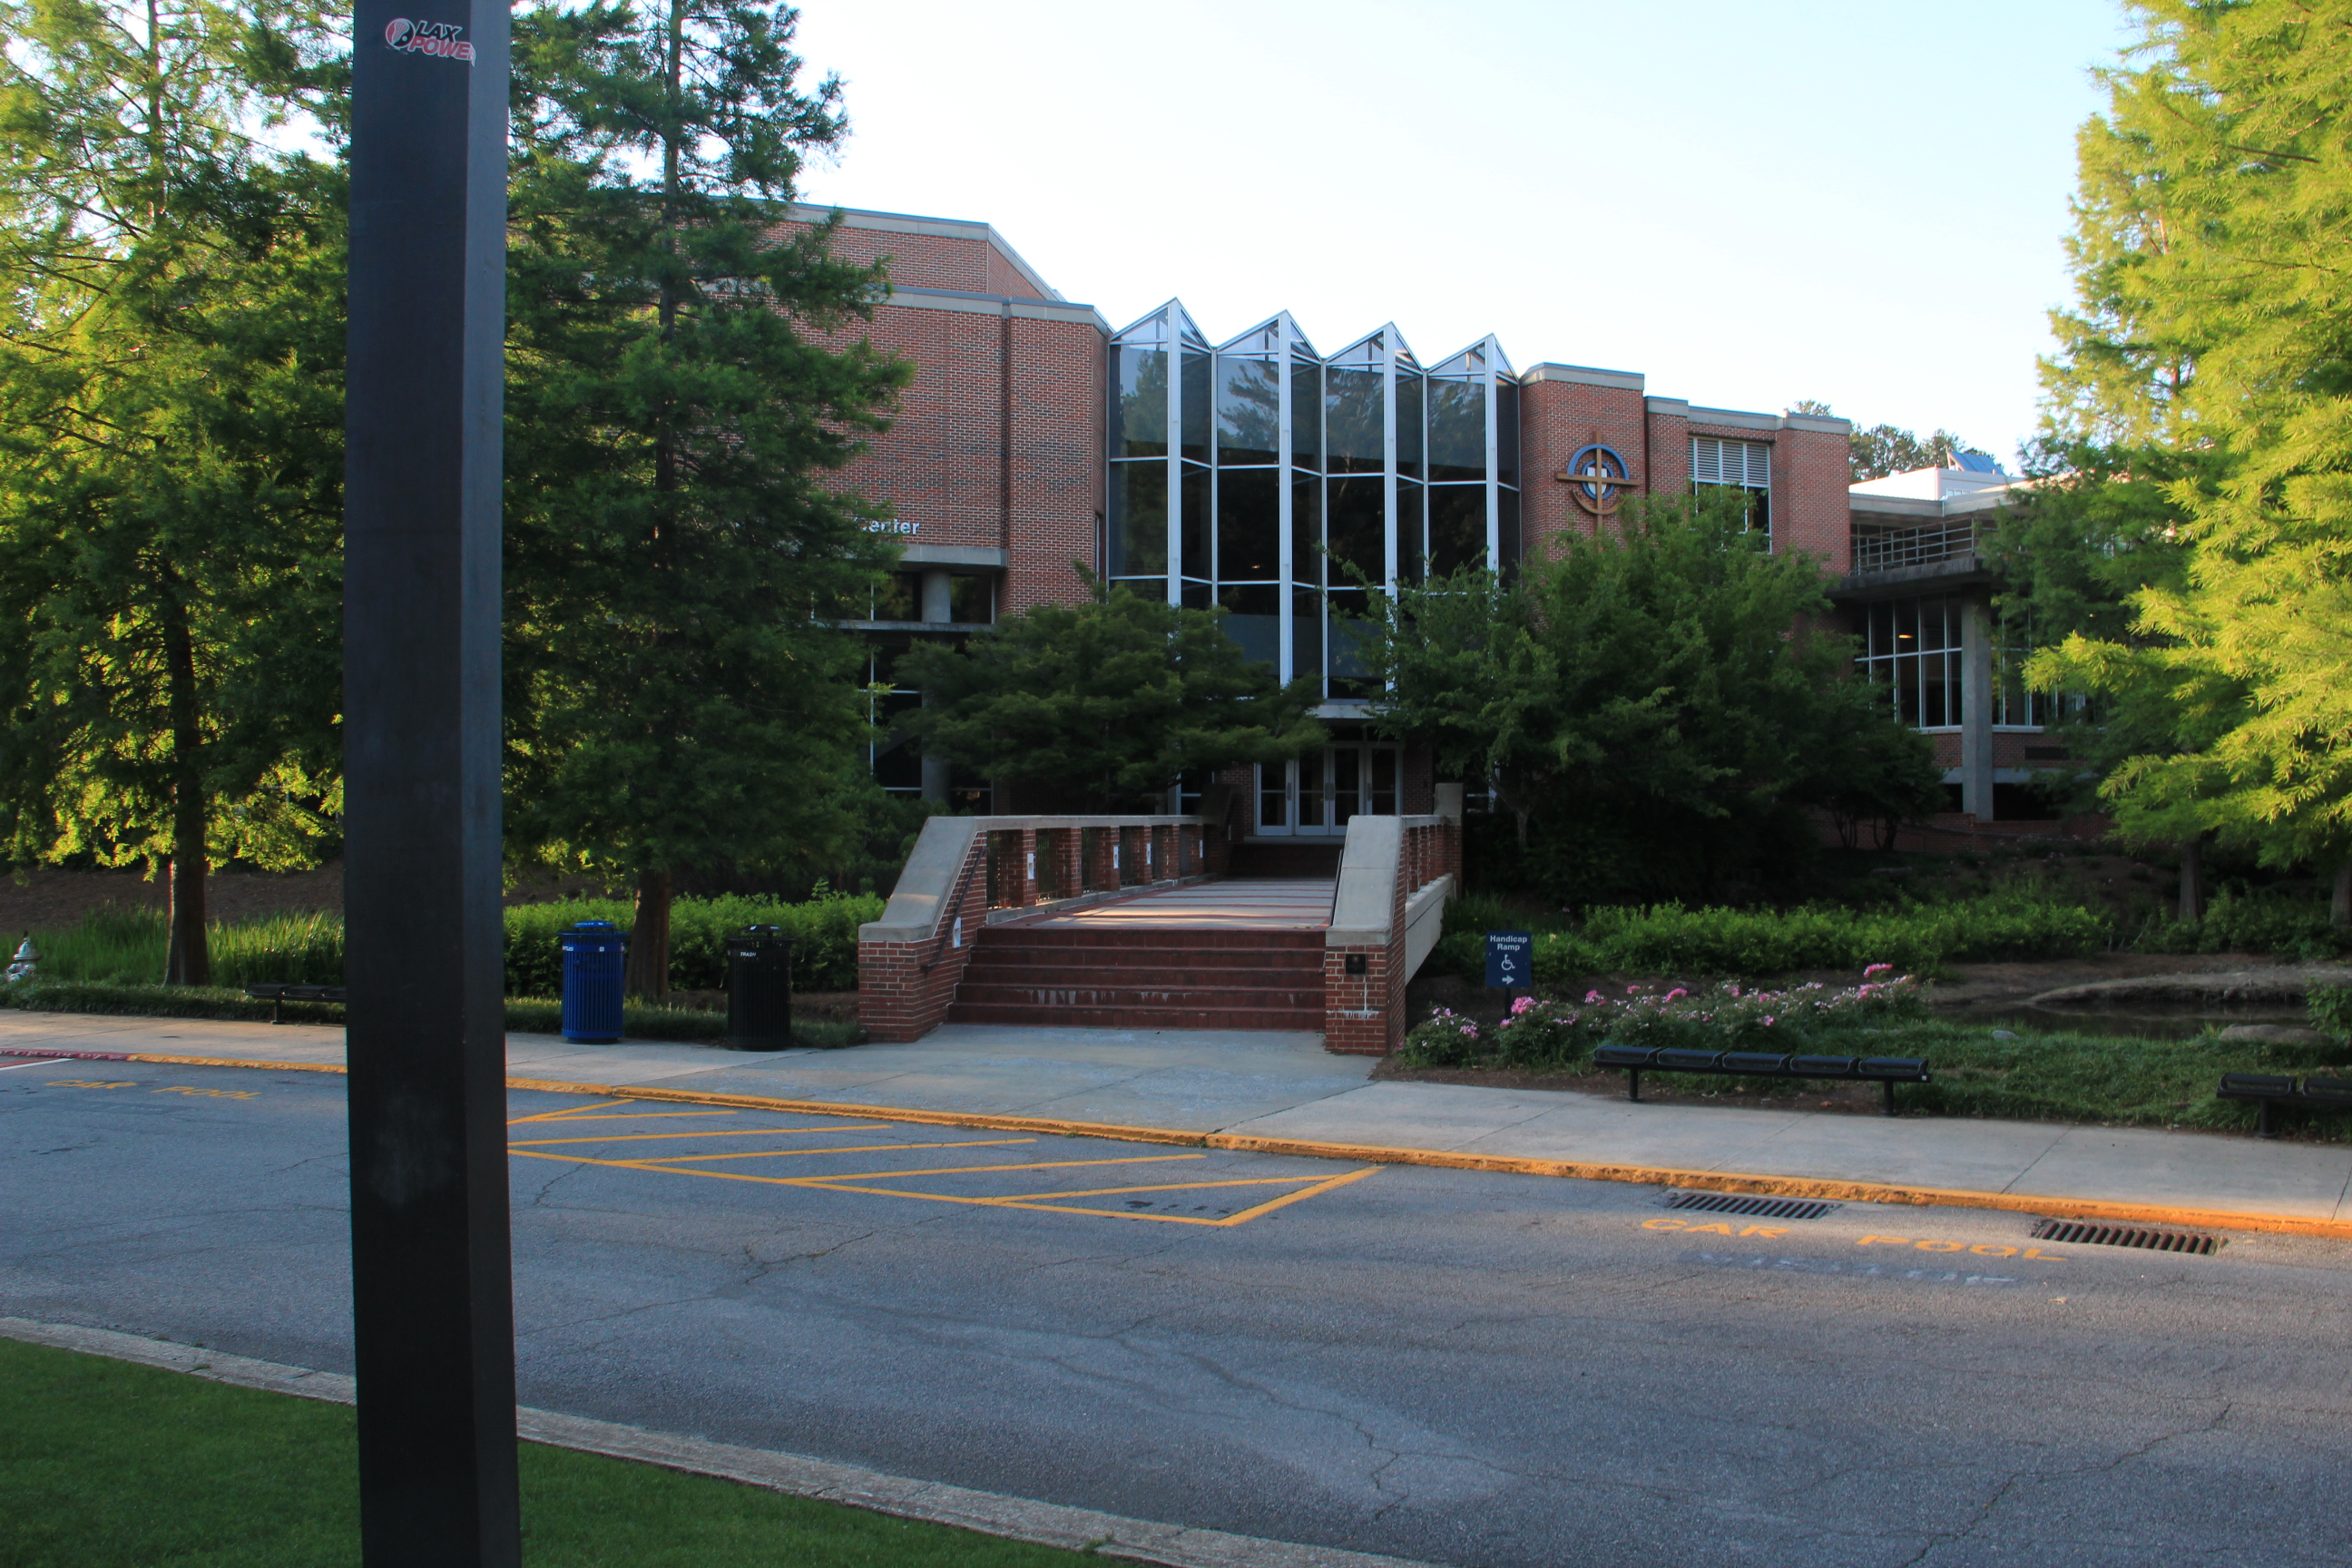 Lovett School - Wikipedia